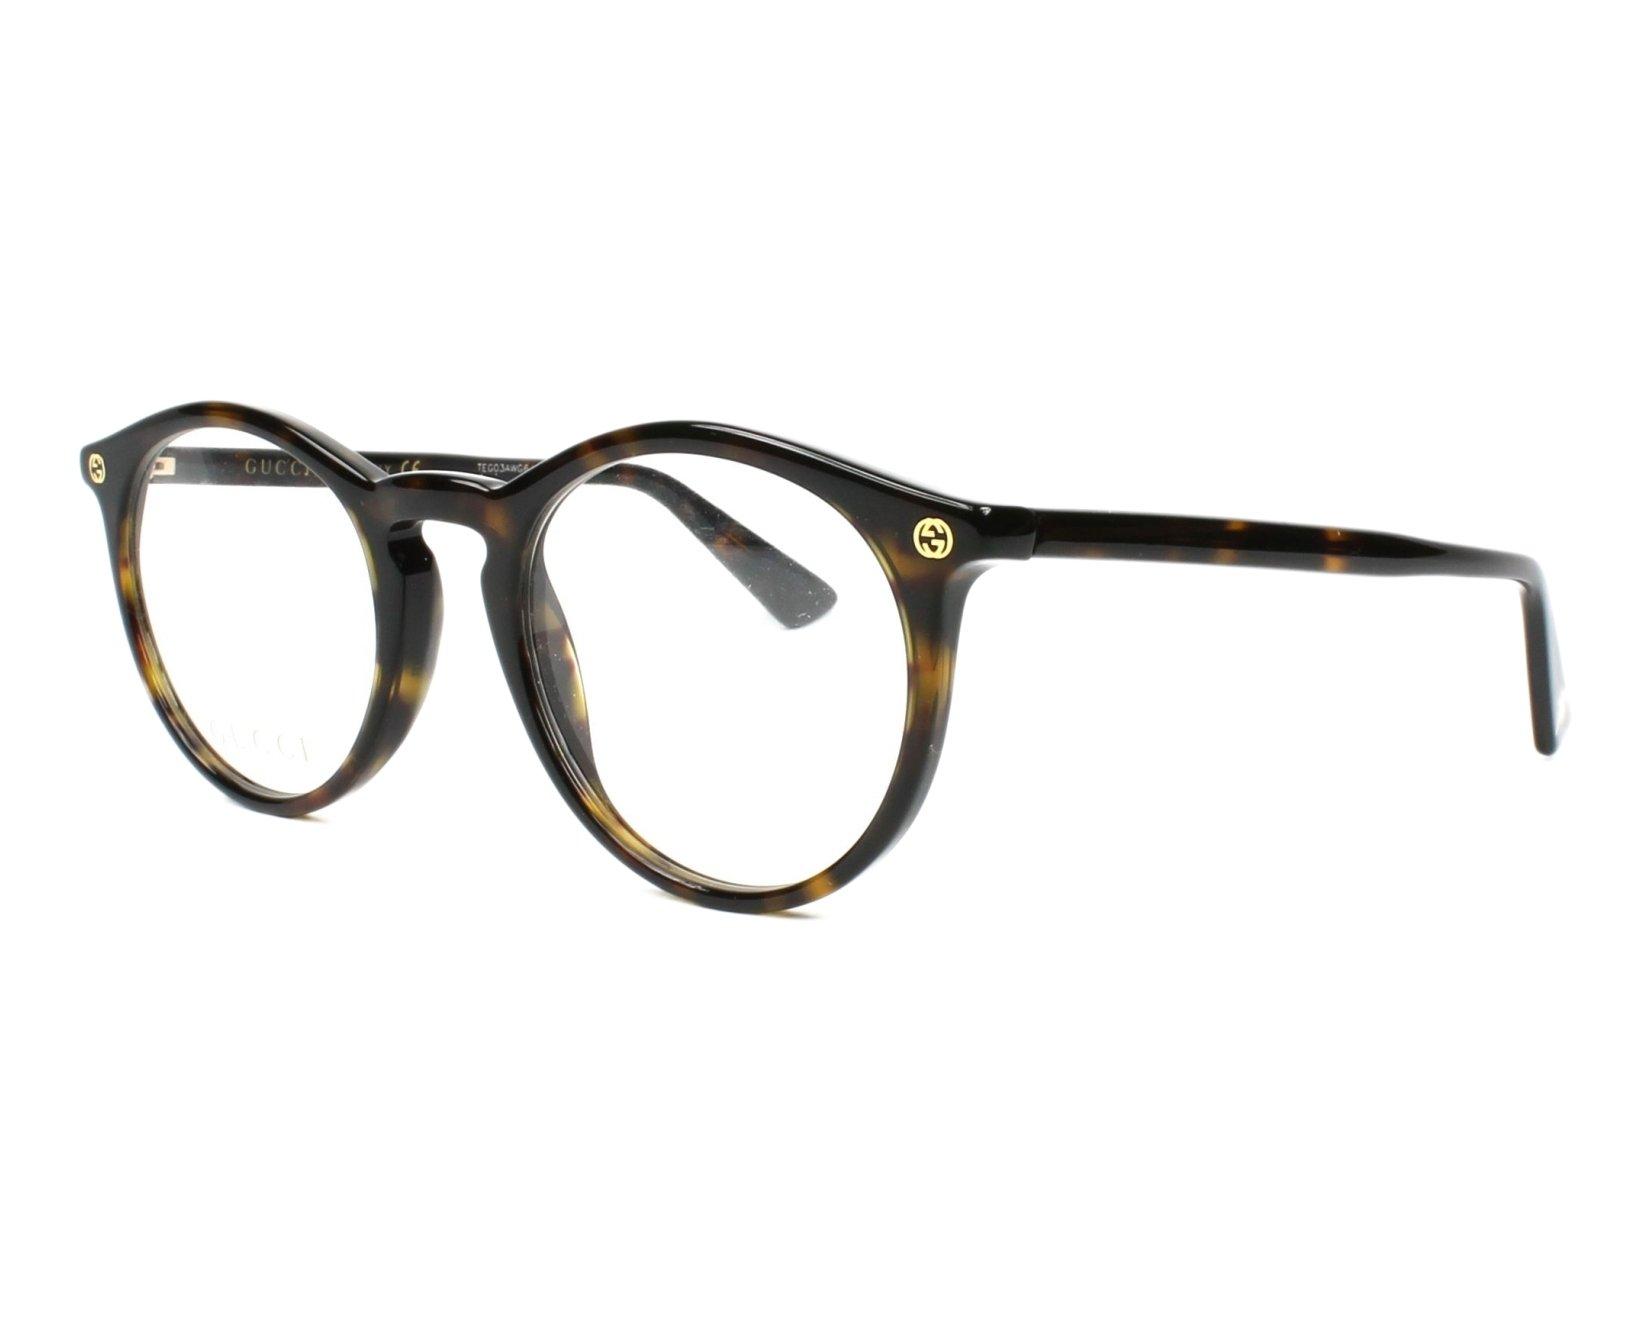 9a04d830417a Eyeglasses Gucci GG 0121 O- 002 002 AVANA   AVANA